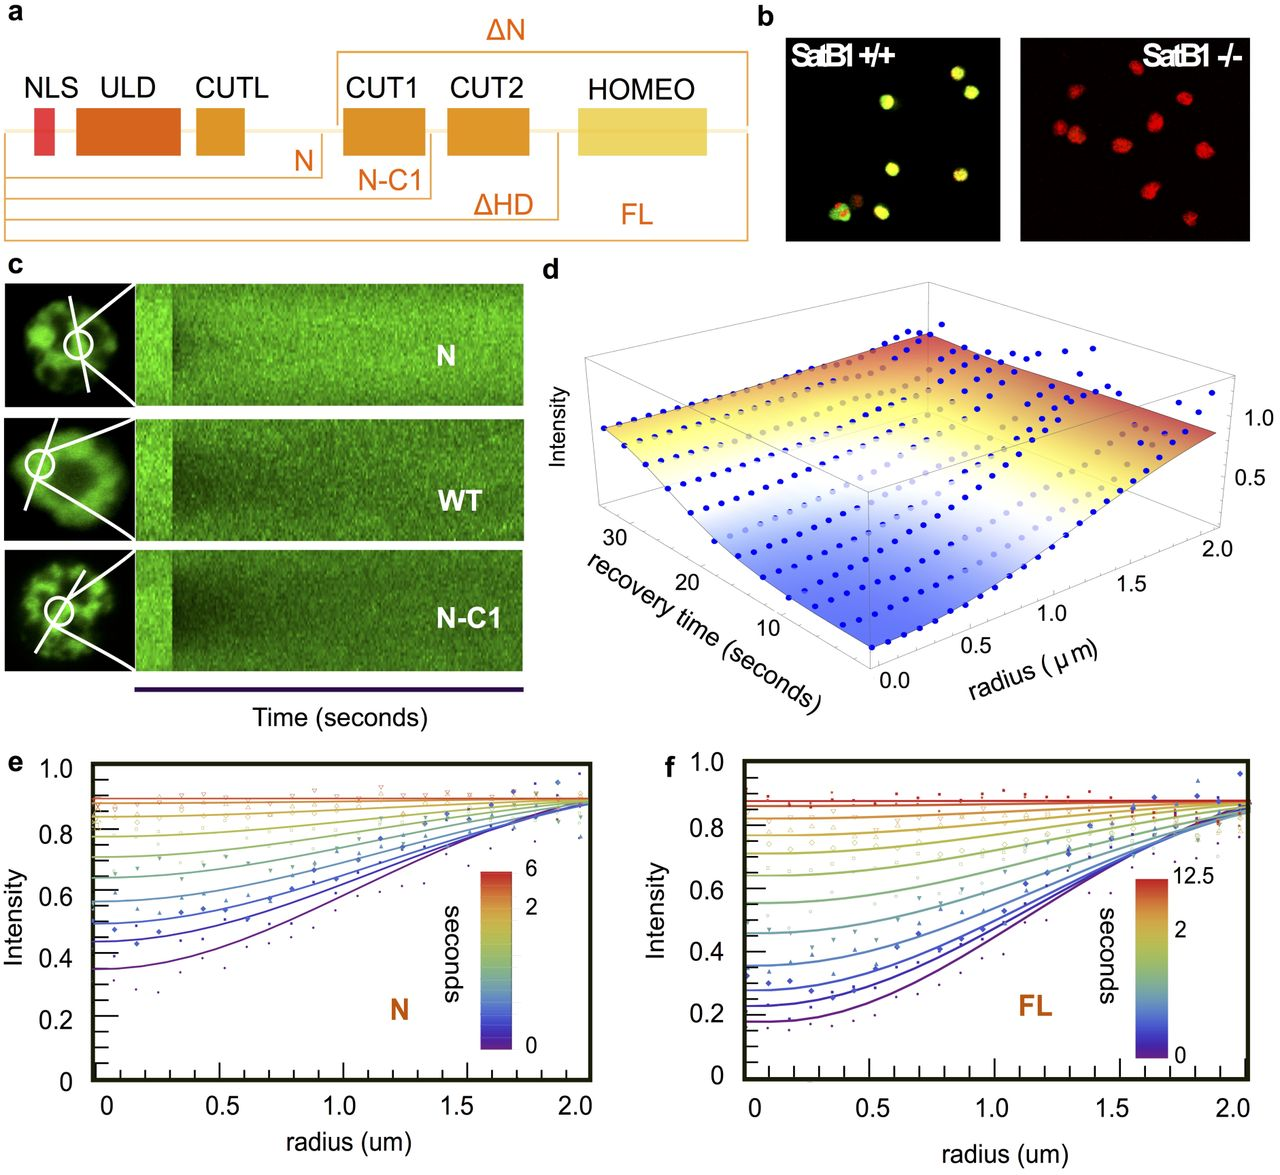 Satb1integrates DNA sequence,shape, motif densityand torsional